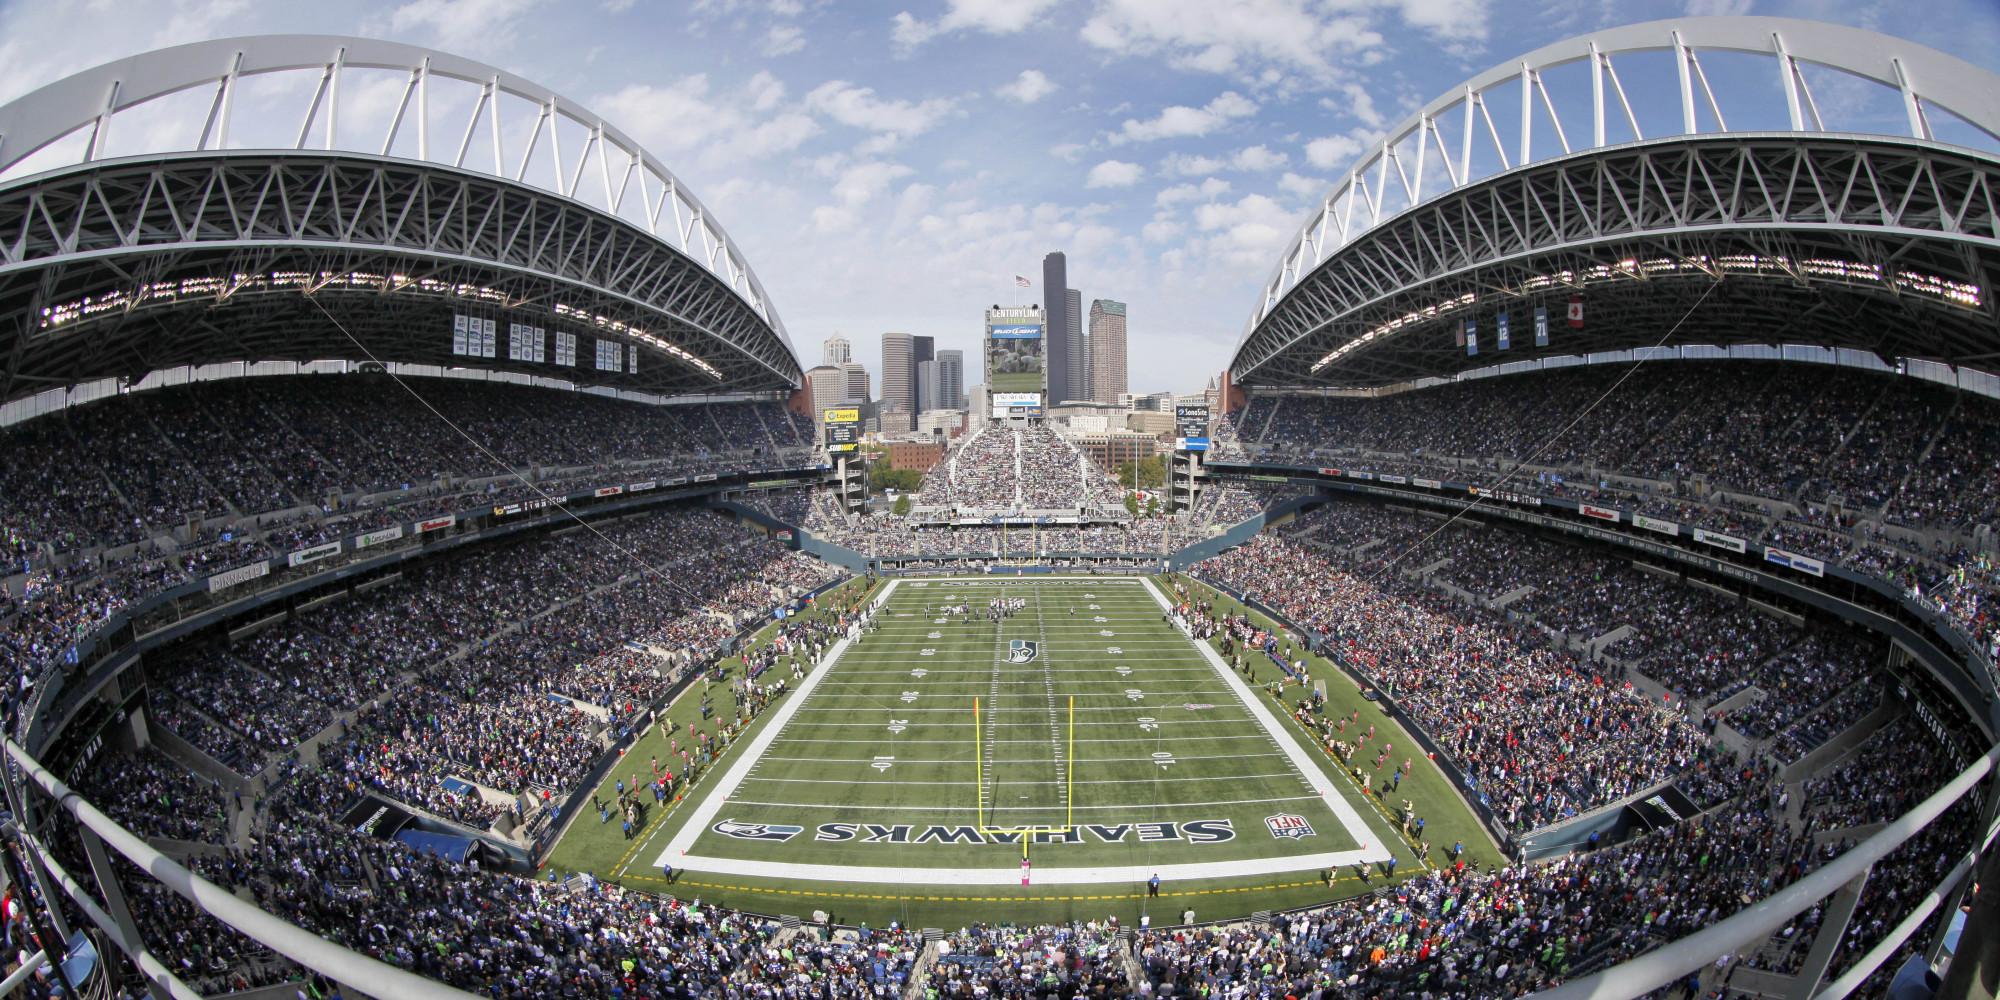 Nfl Football Field Wallpaper Seattle seahawks nfl football 2000x1000